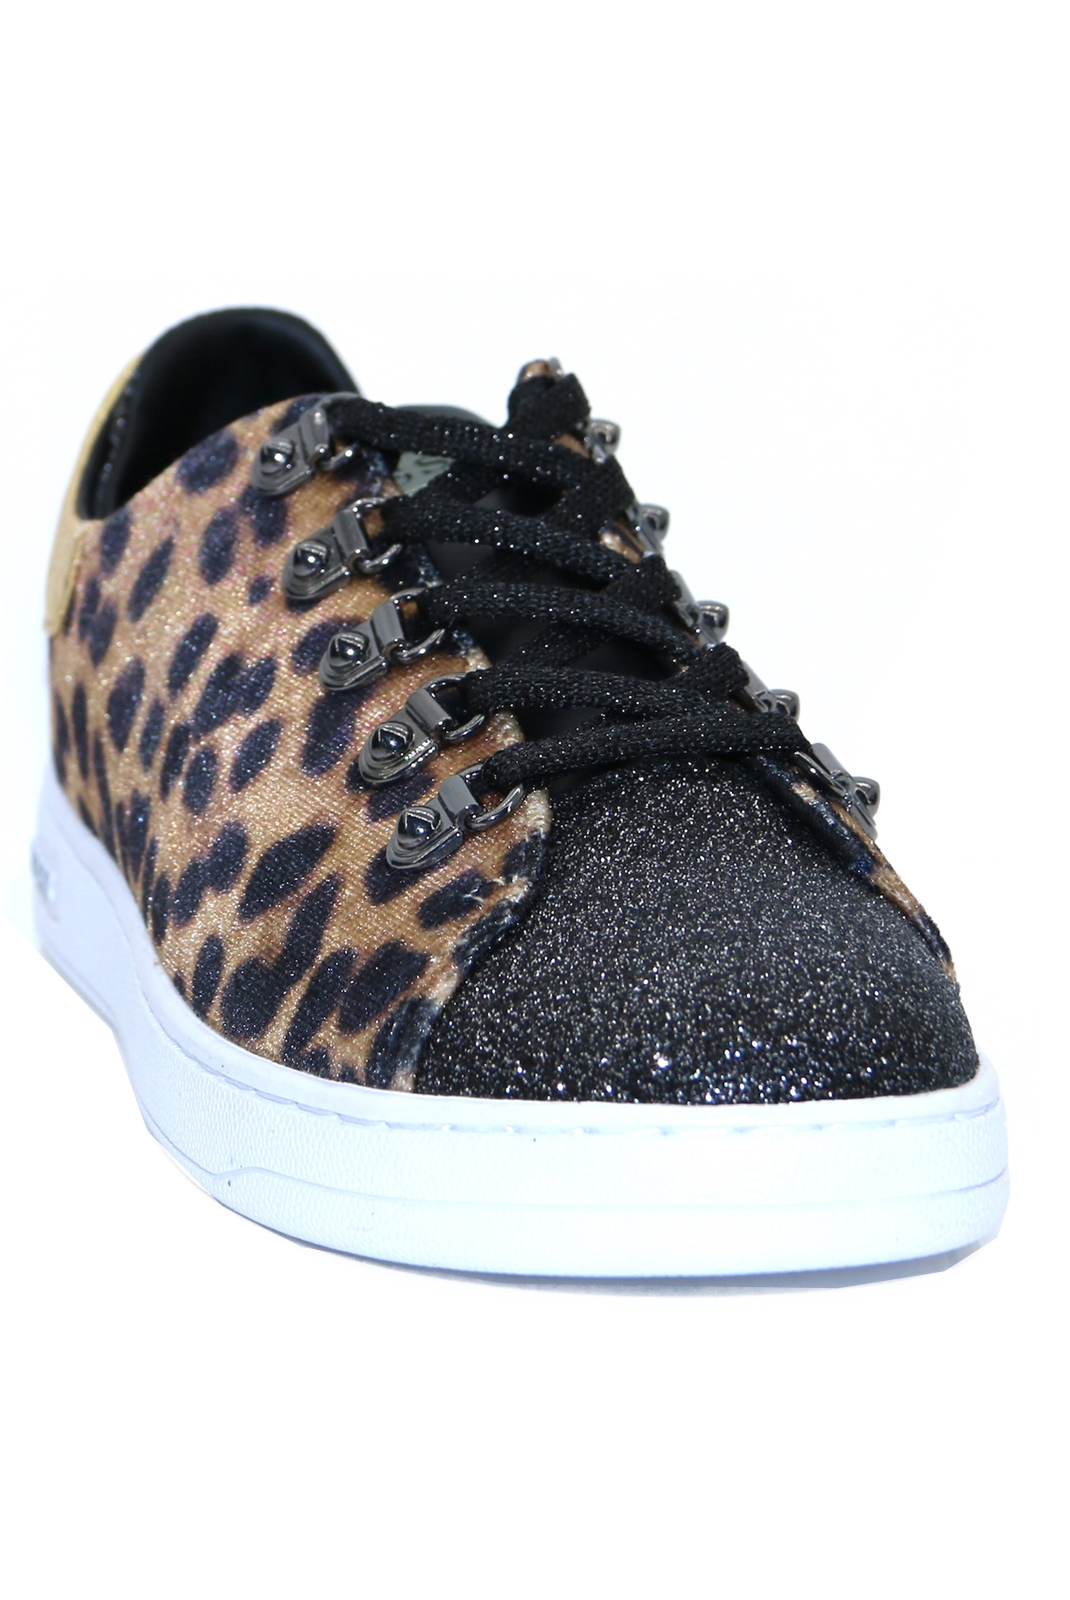 Baskets / Sneakers  Guess jeans FL8CH2 FAP12 charlez BROWN